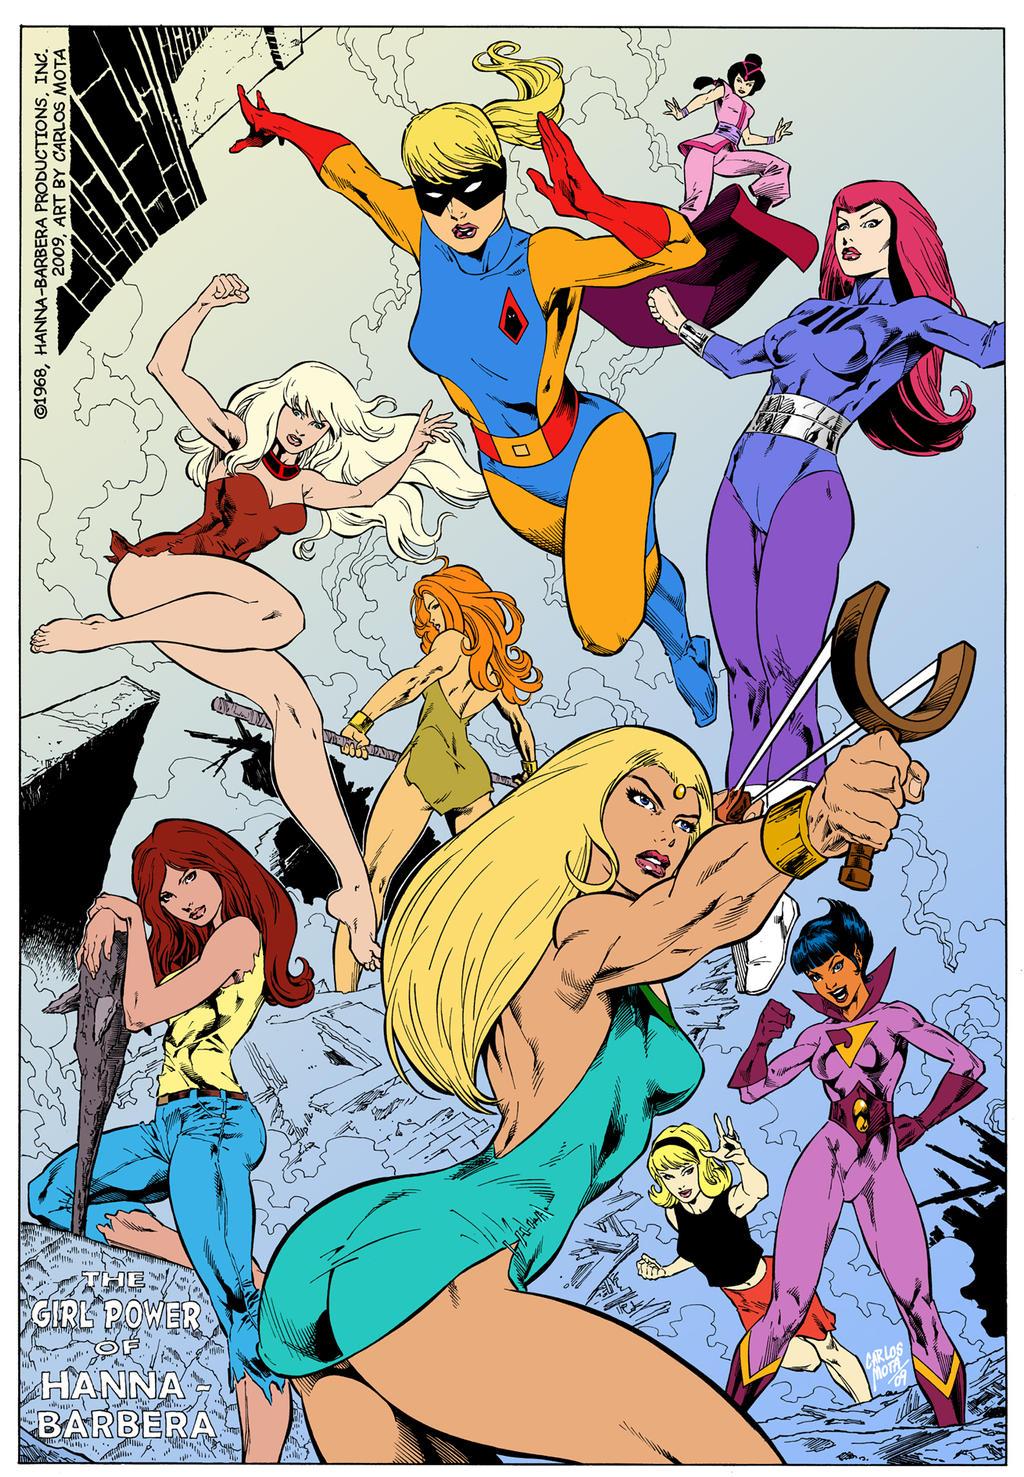 Image of Hanna-Barbera heroines